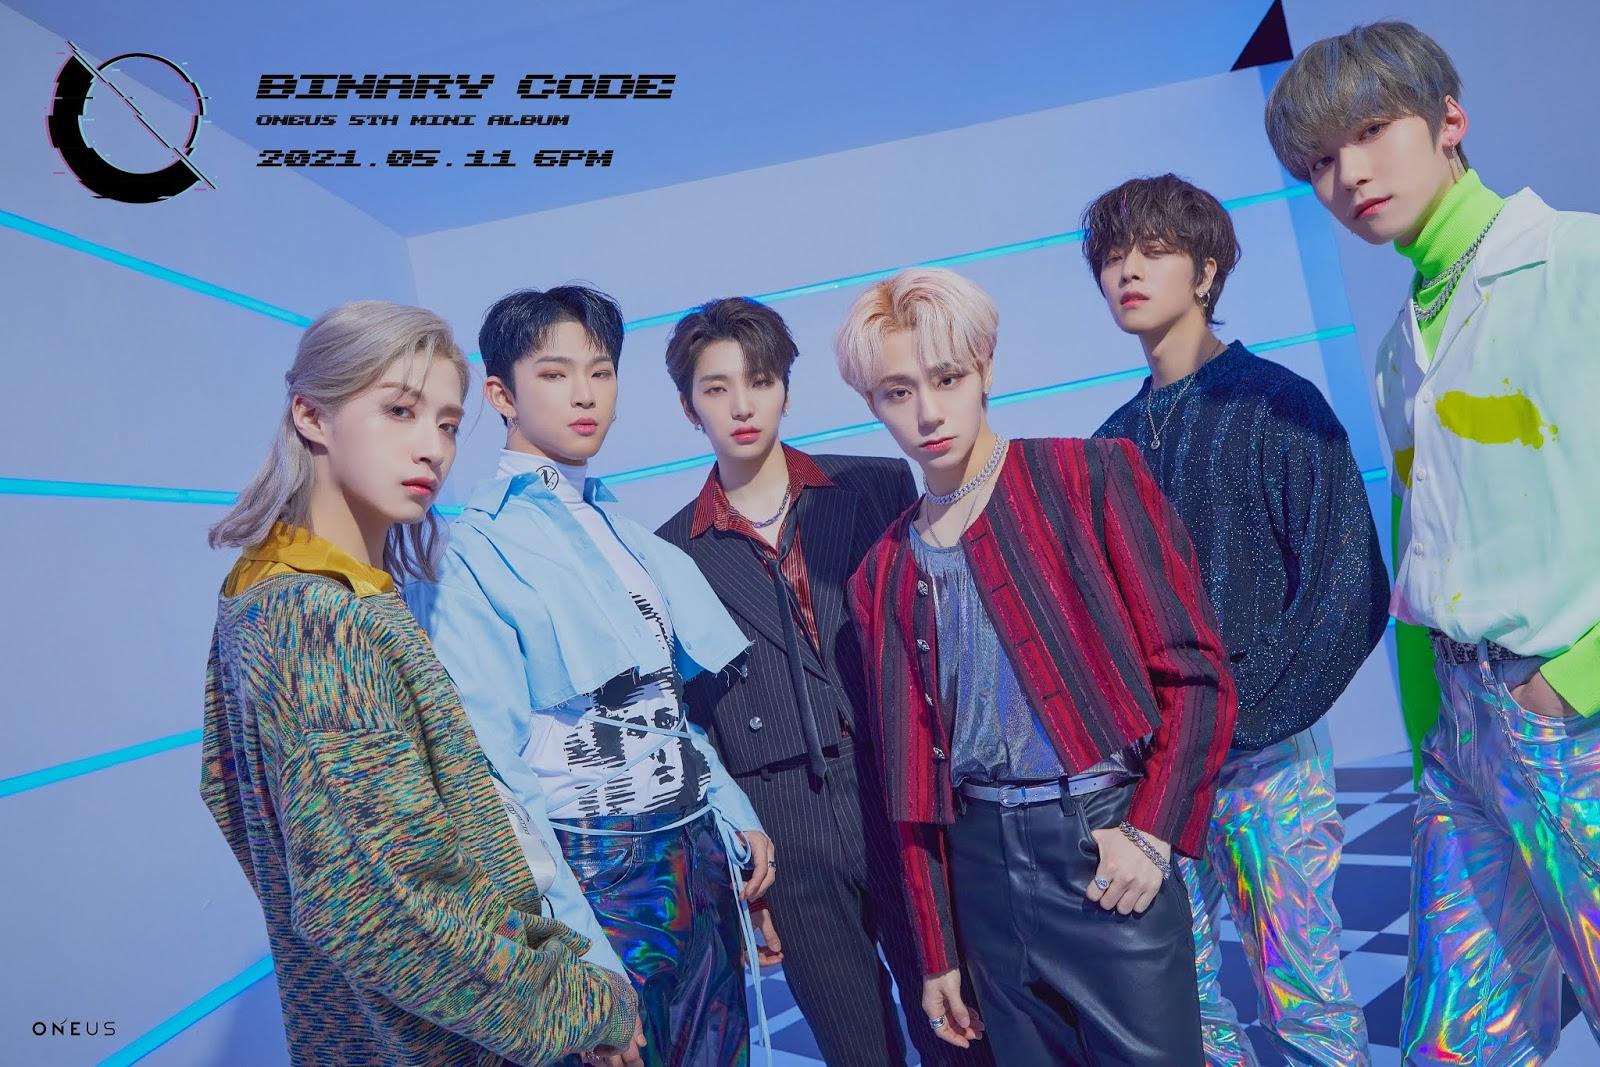 oneus binary code teaser 2